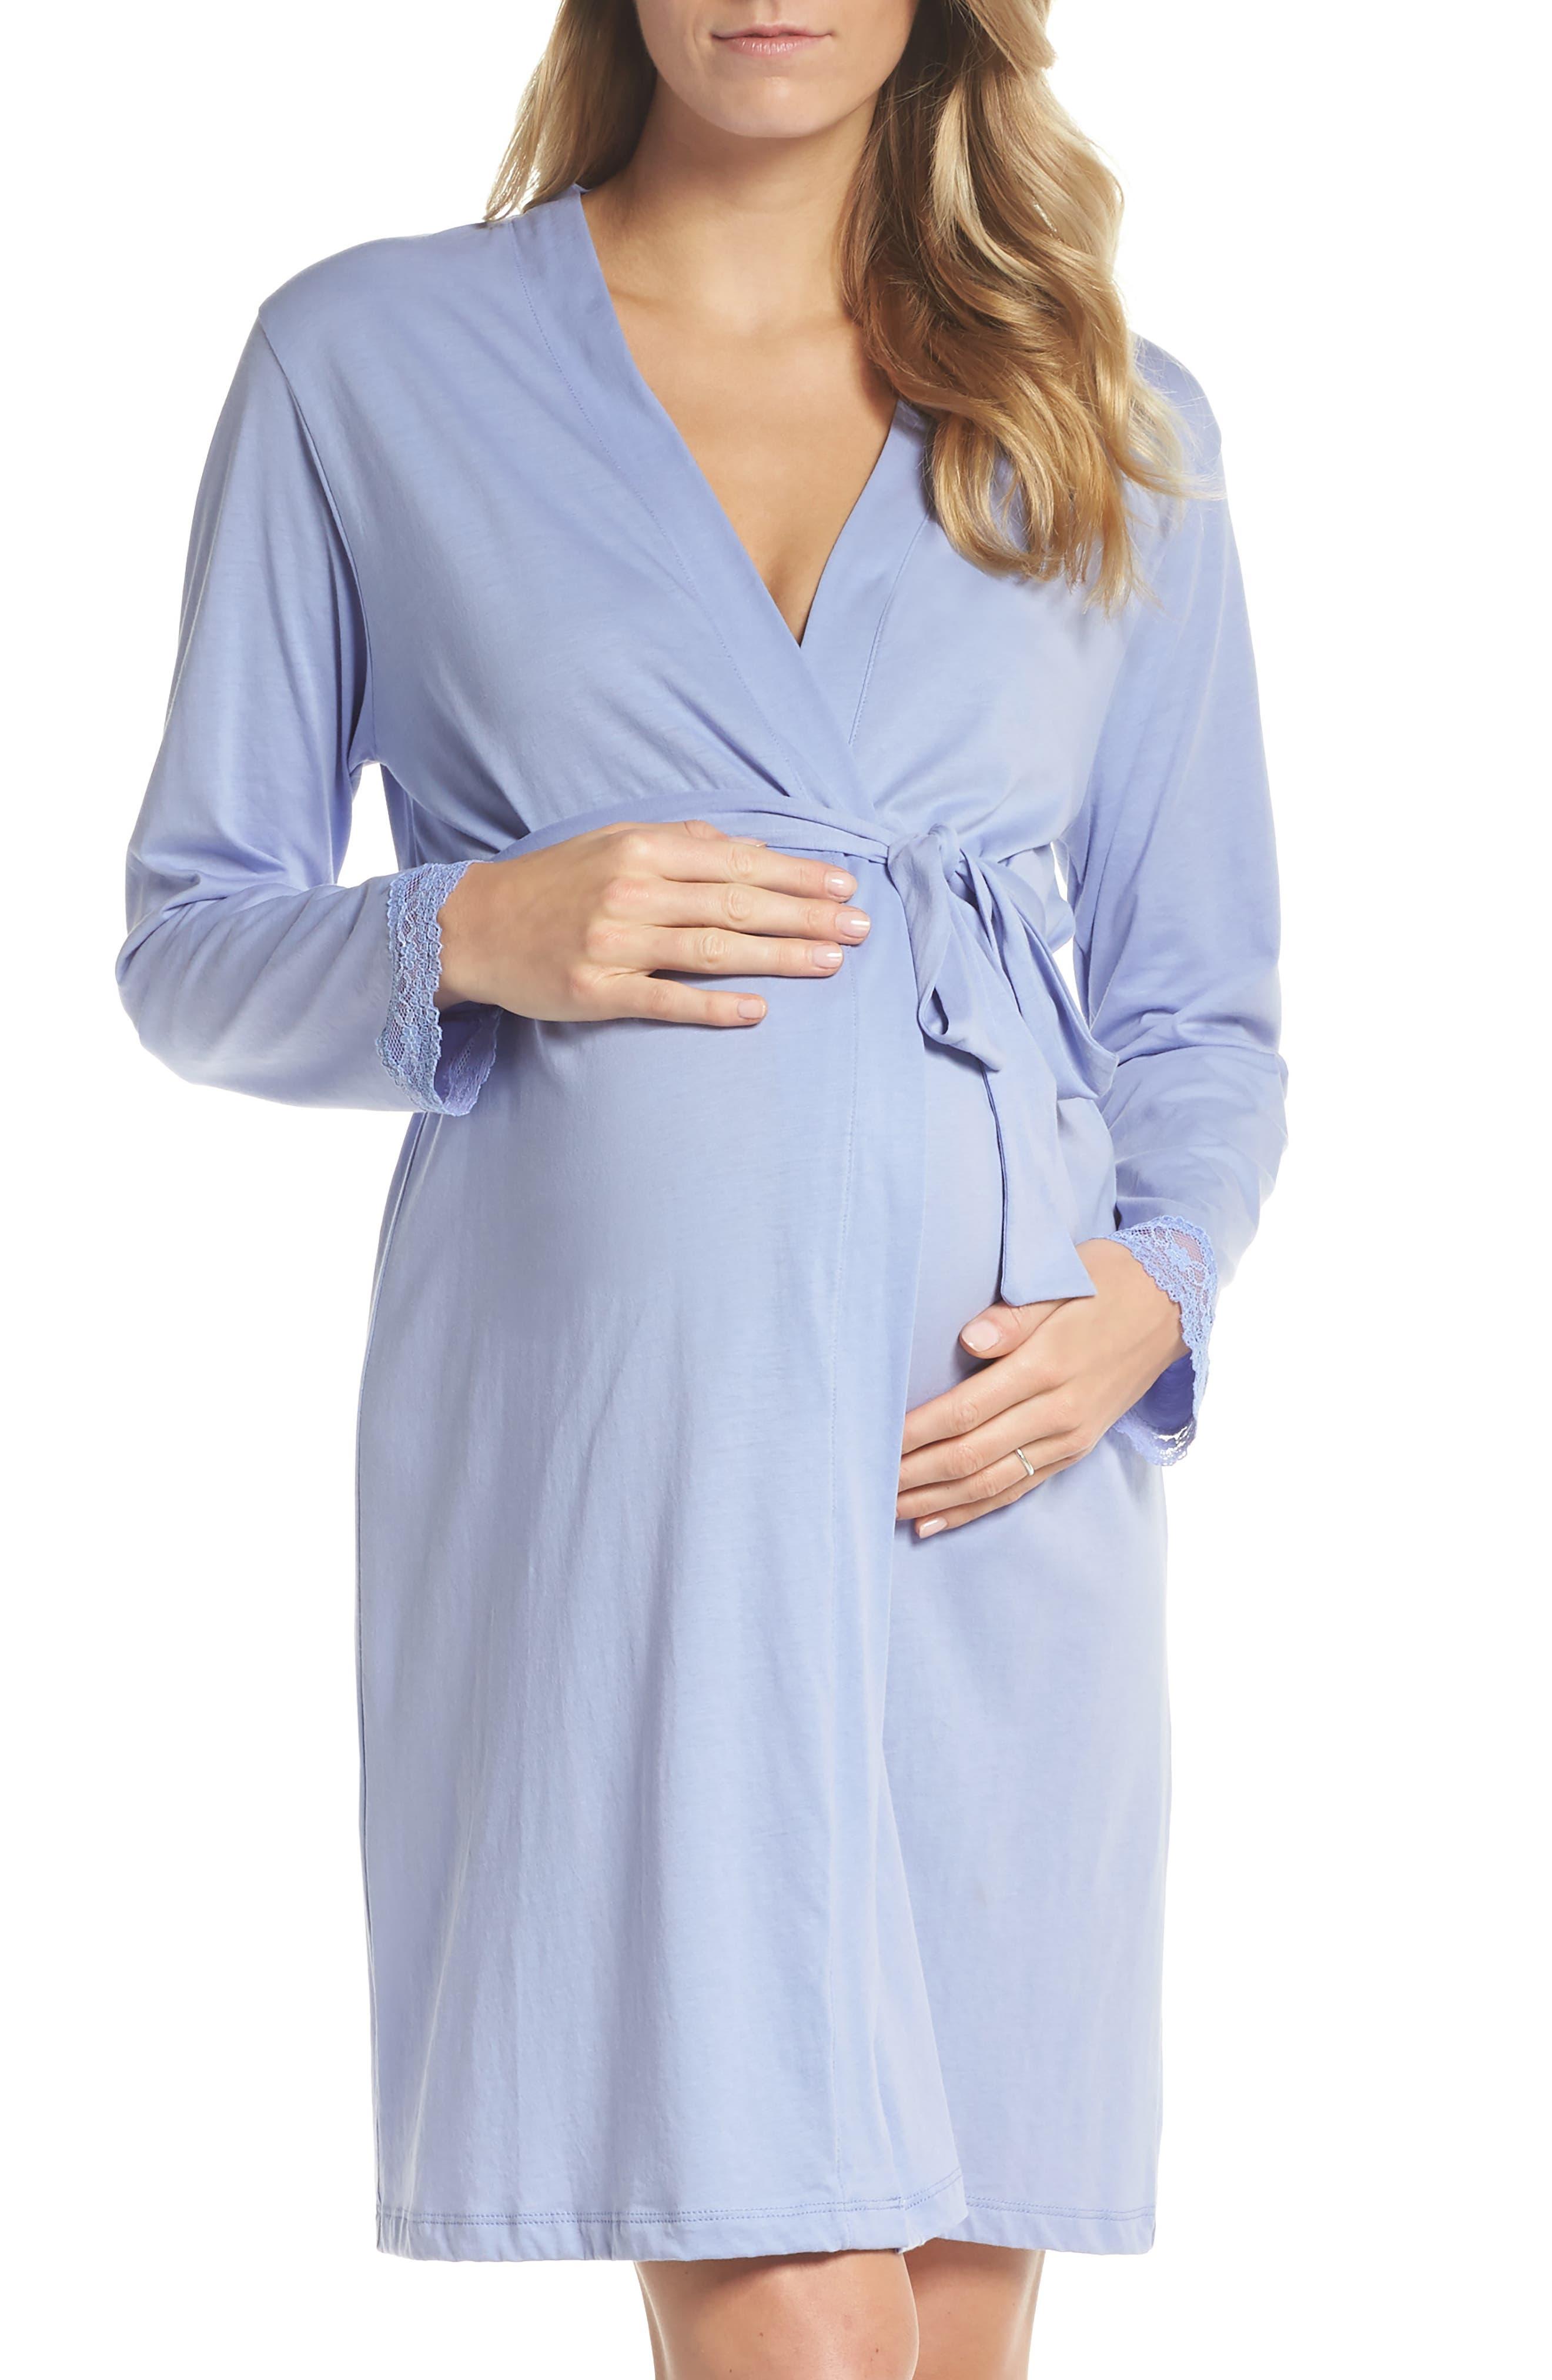 Belabumbum Violette Maternity/Nursing Robe